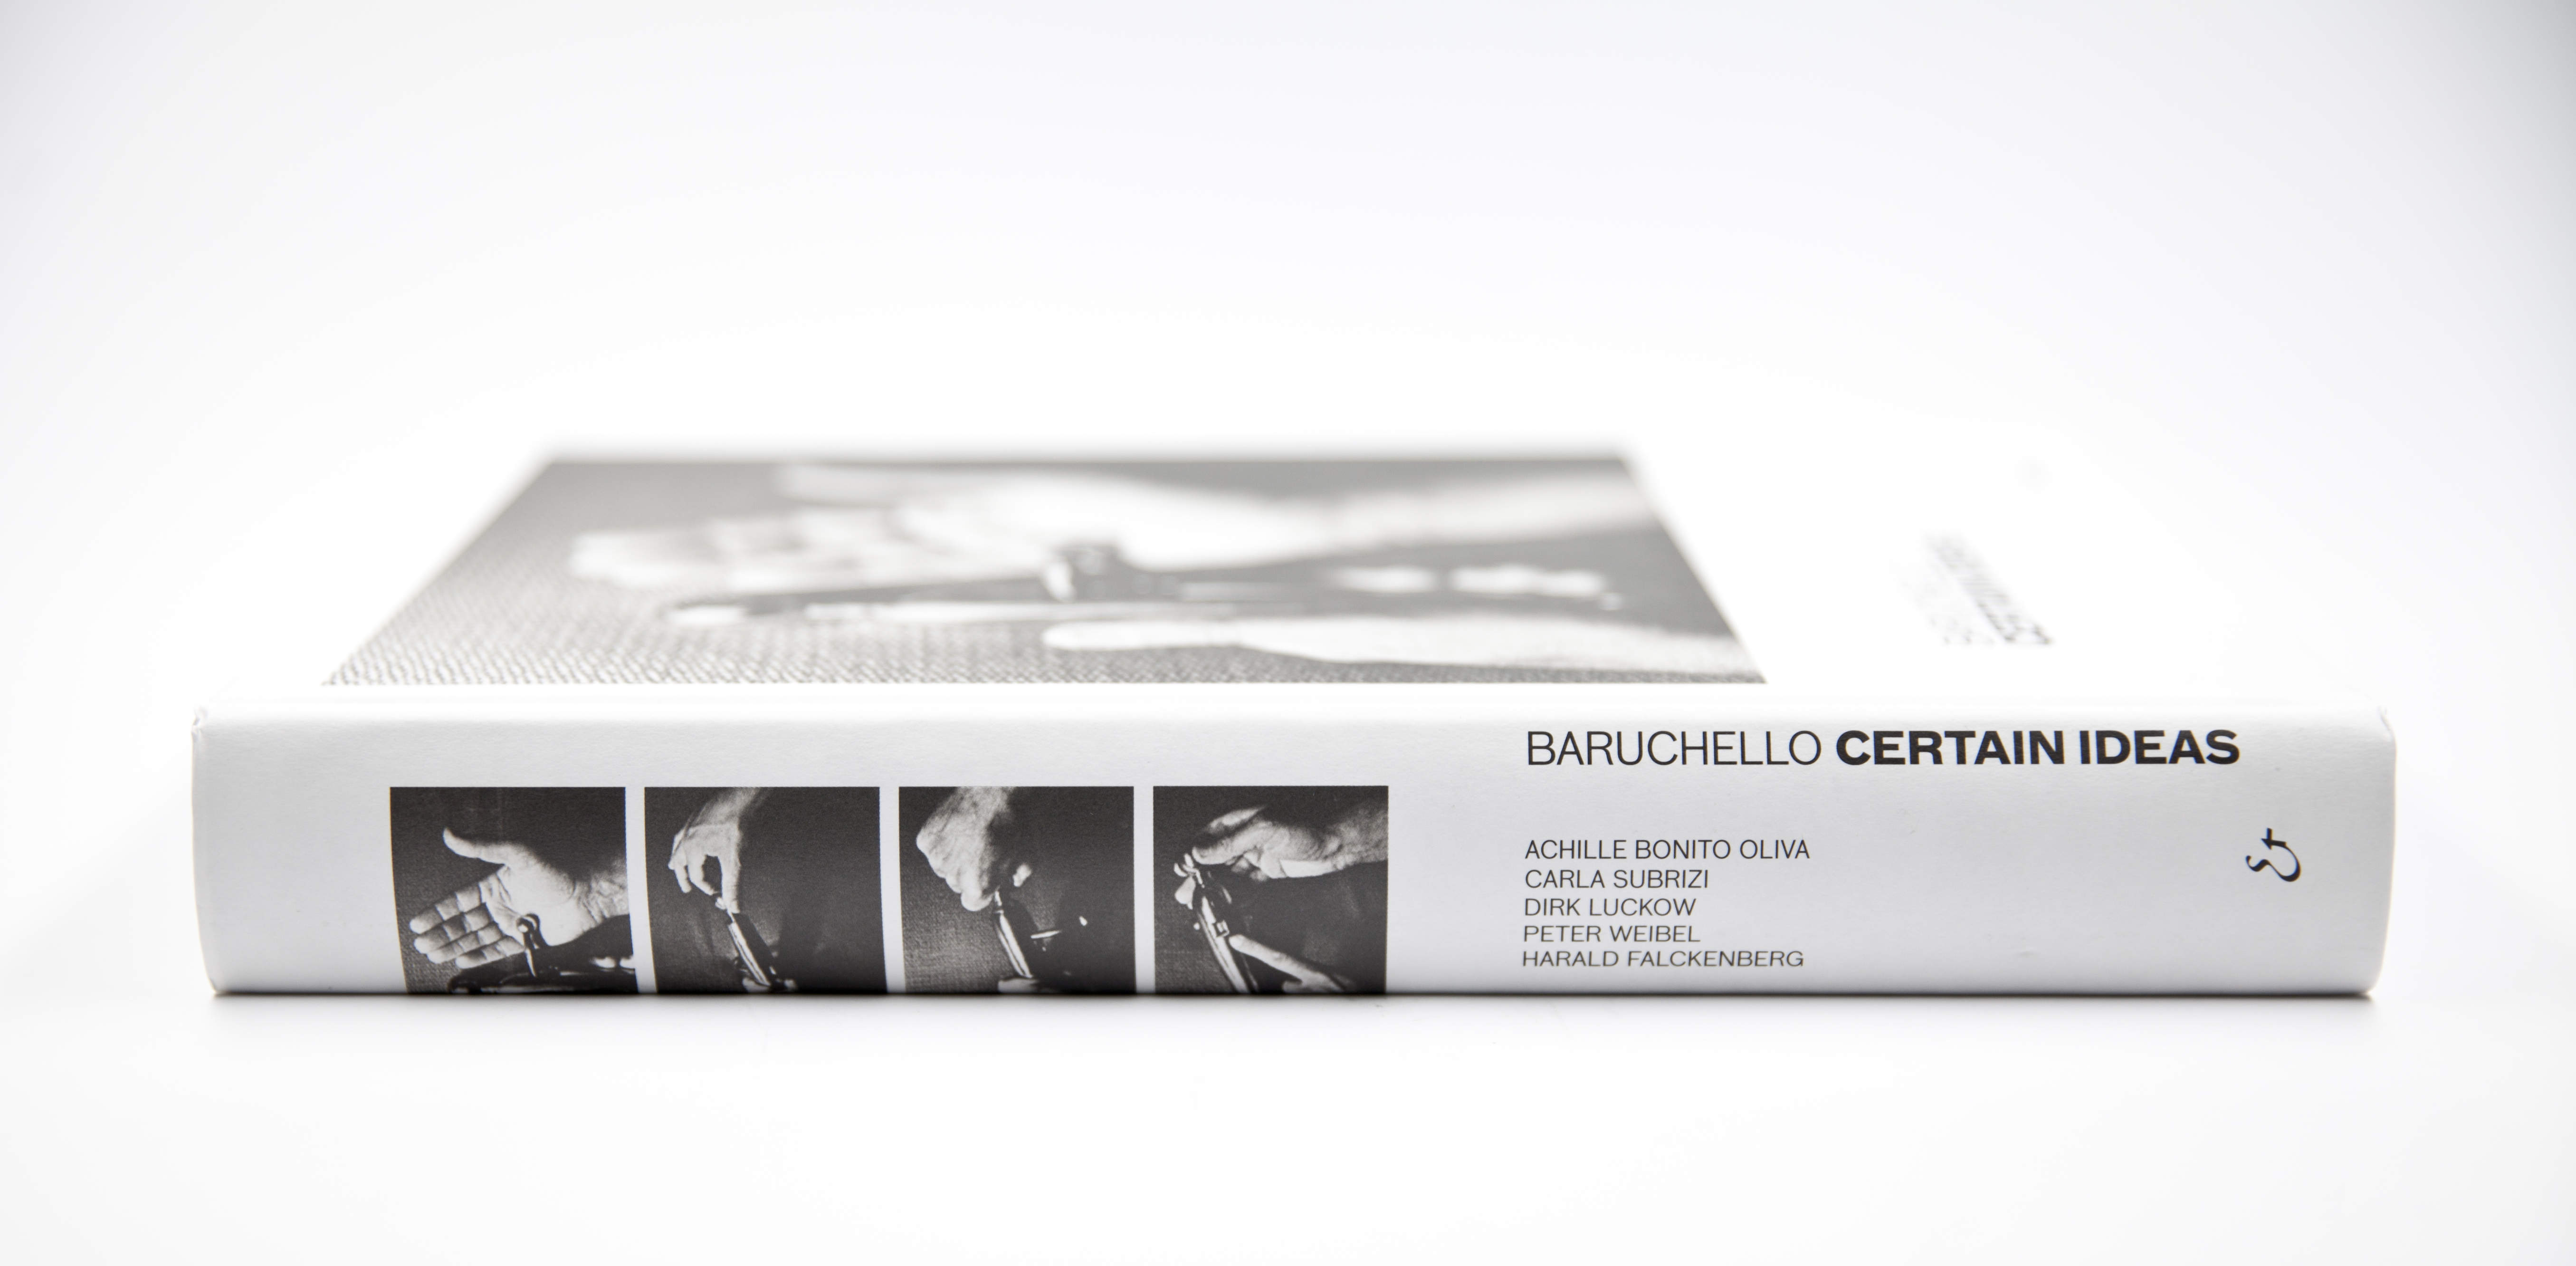 Baruchello: Certain Ideas